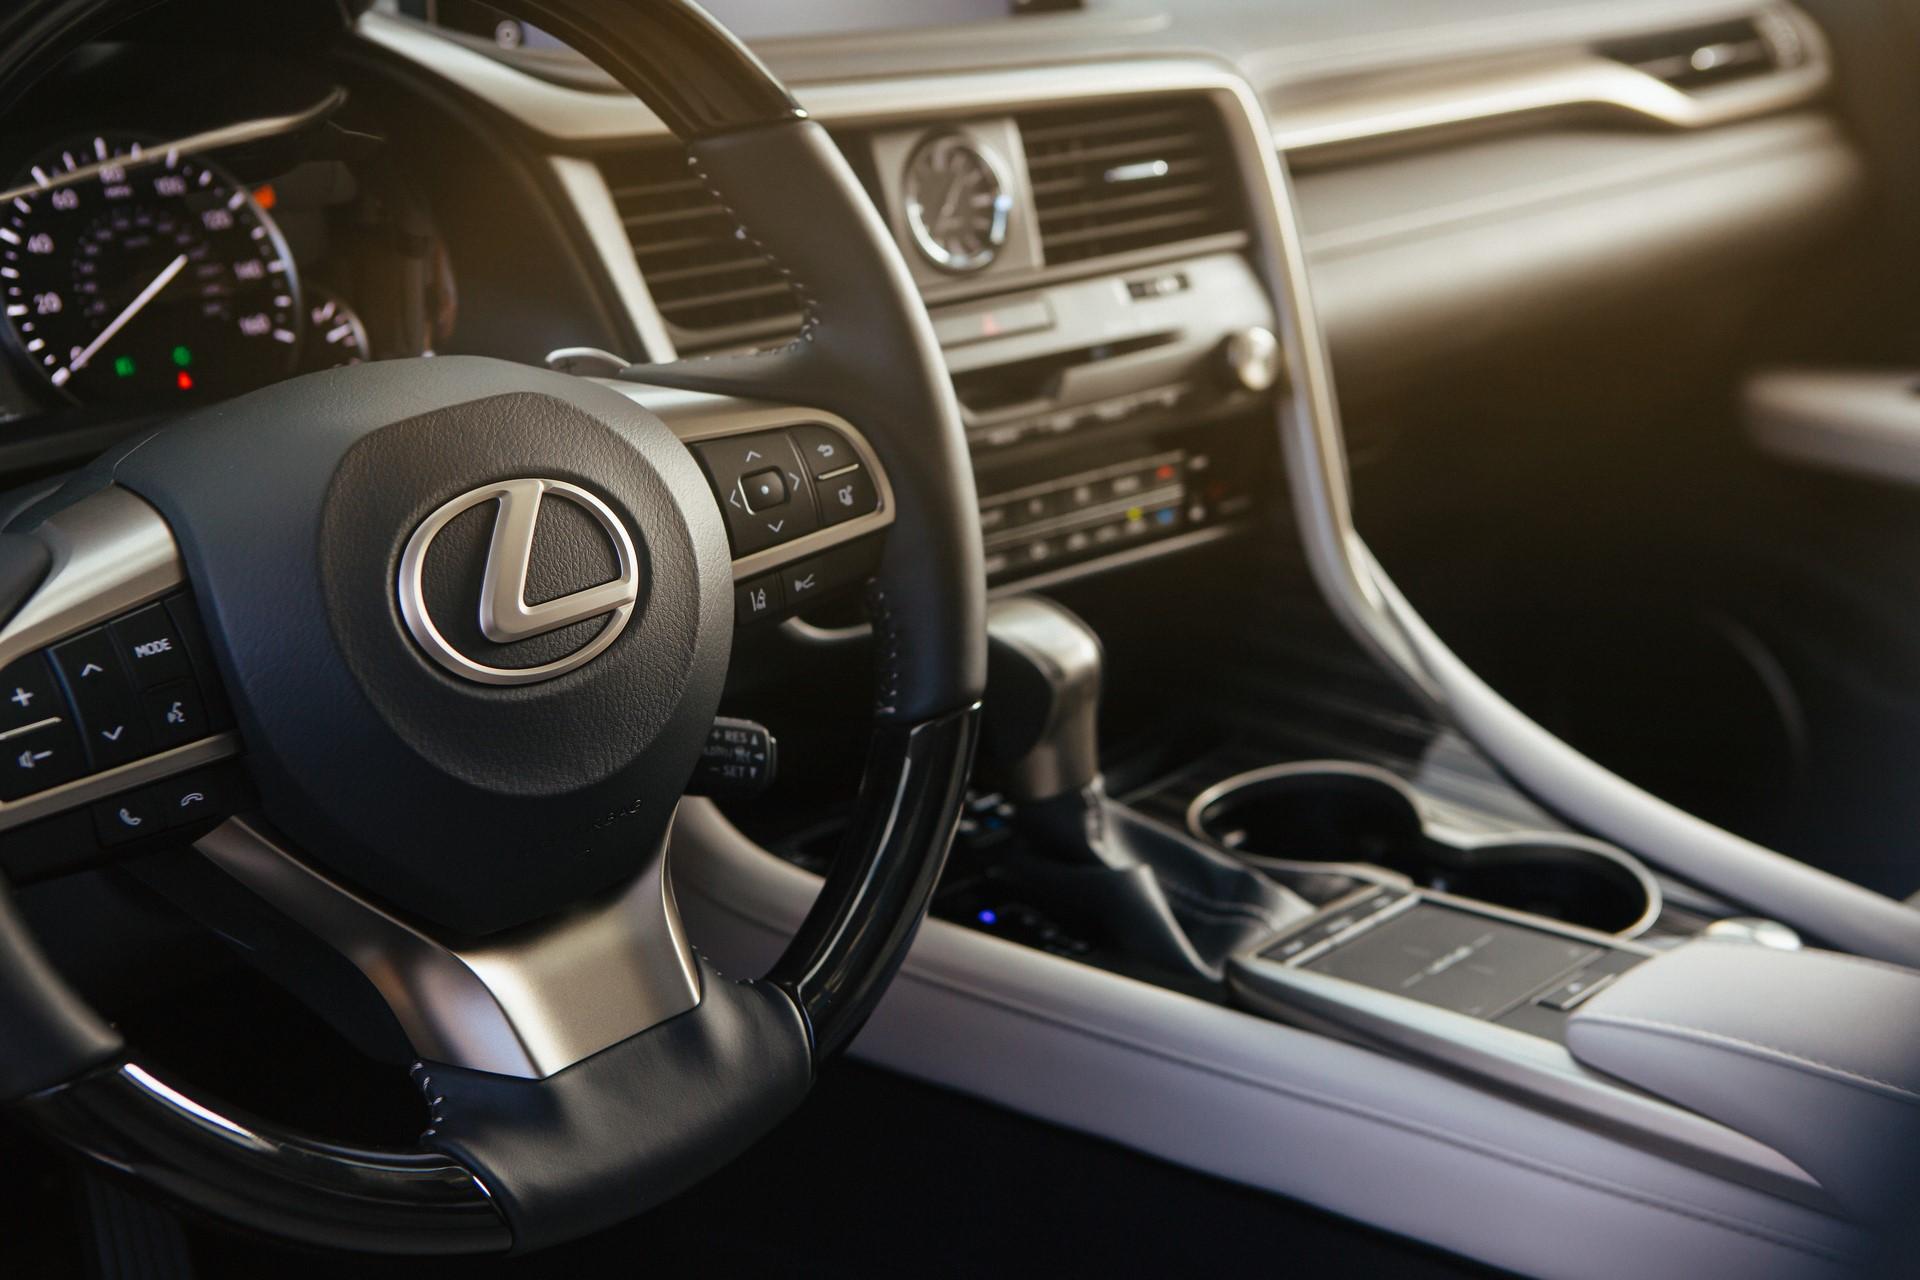 2020_Lexus_RX_450hL_15_DF77ADC3CD0BDCF4BF6B0F08D25569A3087A143F